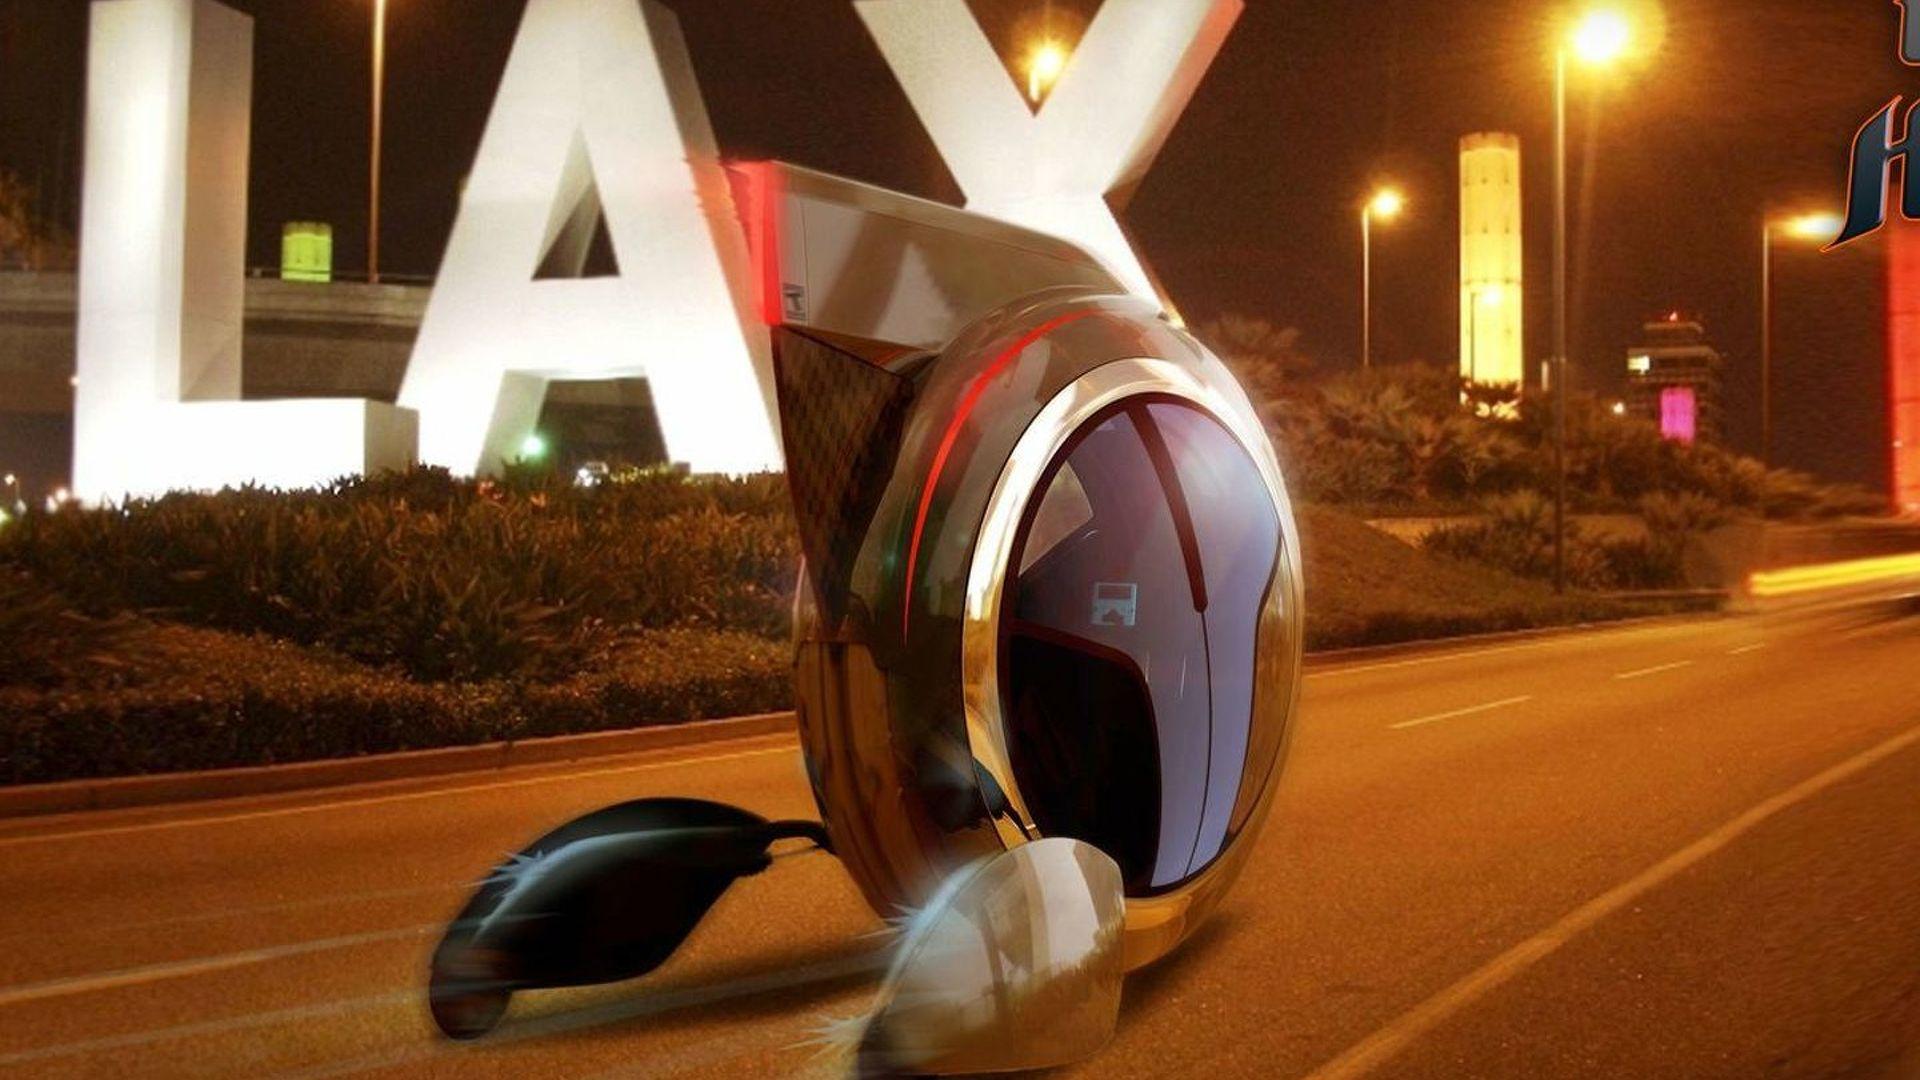 LA Auto Show Design Challenge Entries Announced: Youthmobile 2030